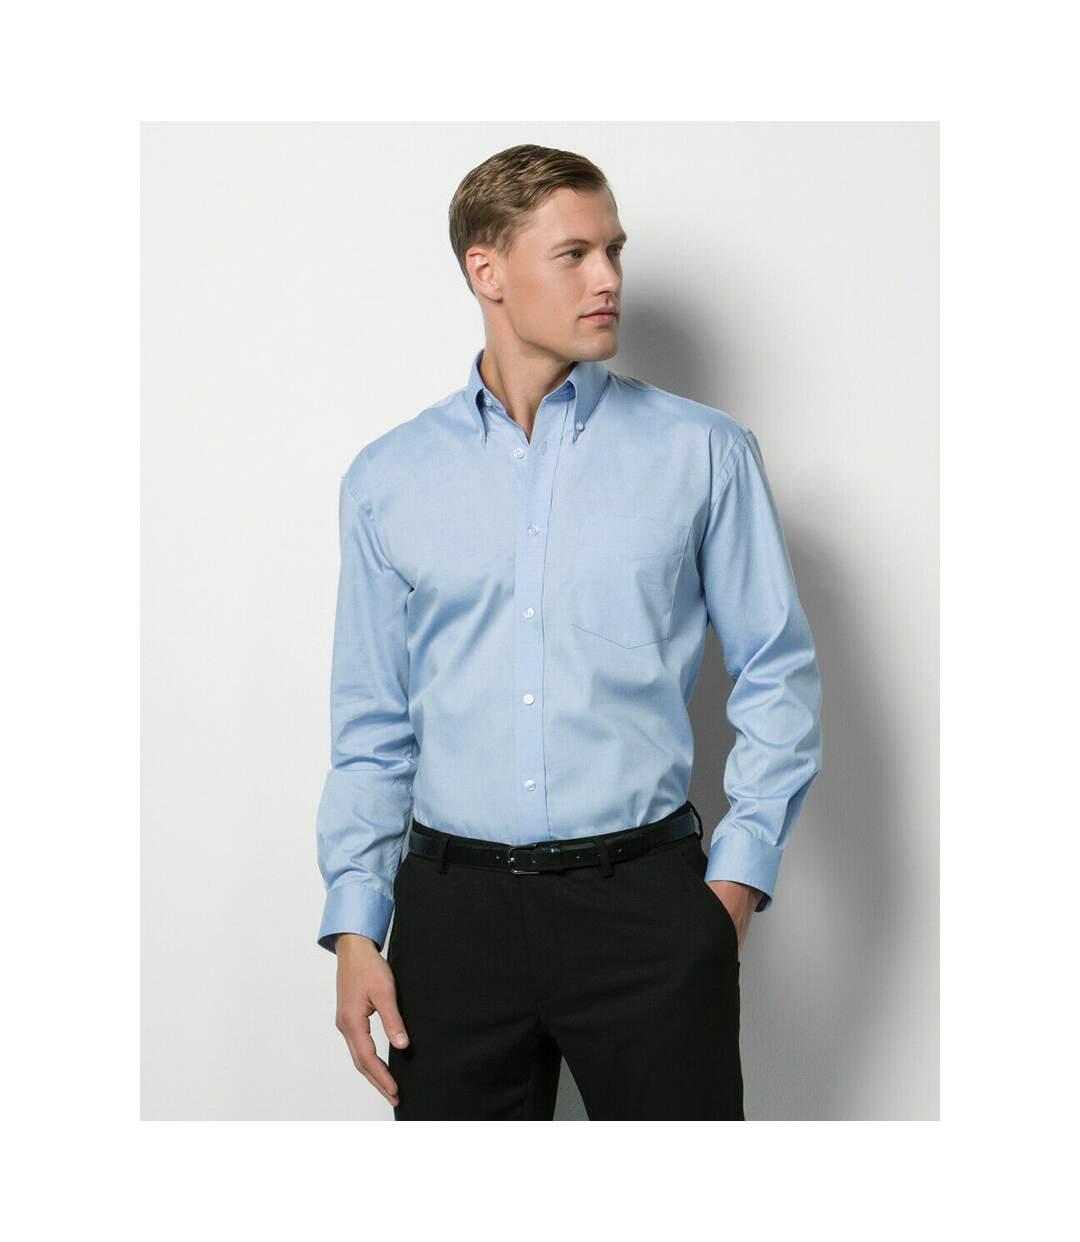 Kustom Kit Mens Long Sleeve Corporate Oxford Shirt (Light Blue) - UTBC594